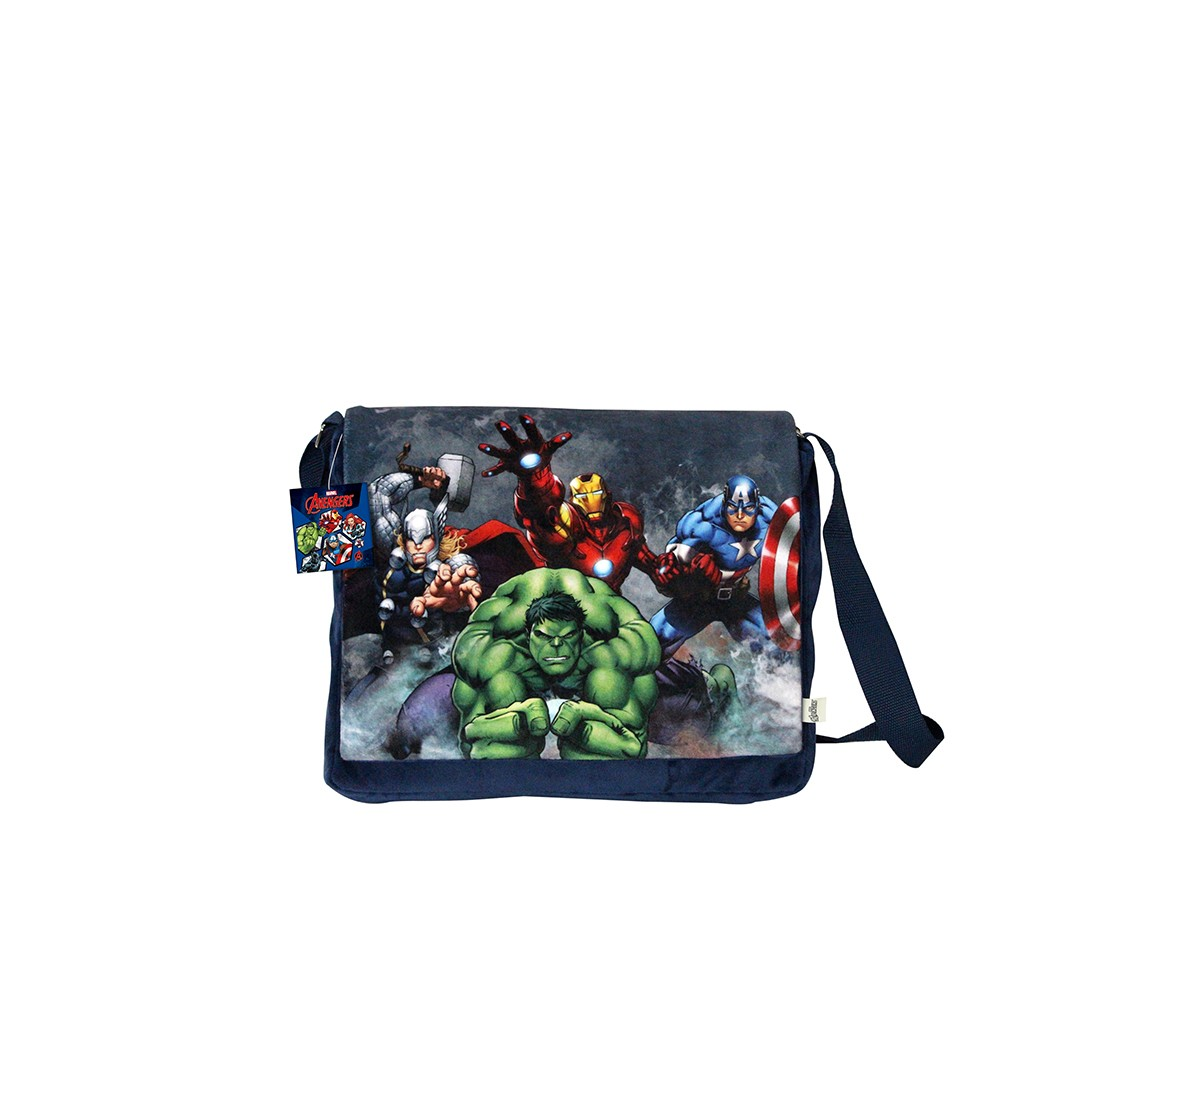 Marvel Happiness Unisex Zipper Closure Avengers Sling Bag_Multi_Free Size Plush Accessories for Kids age 12M+ - 25.4 Cm